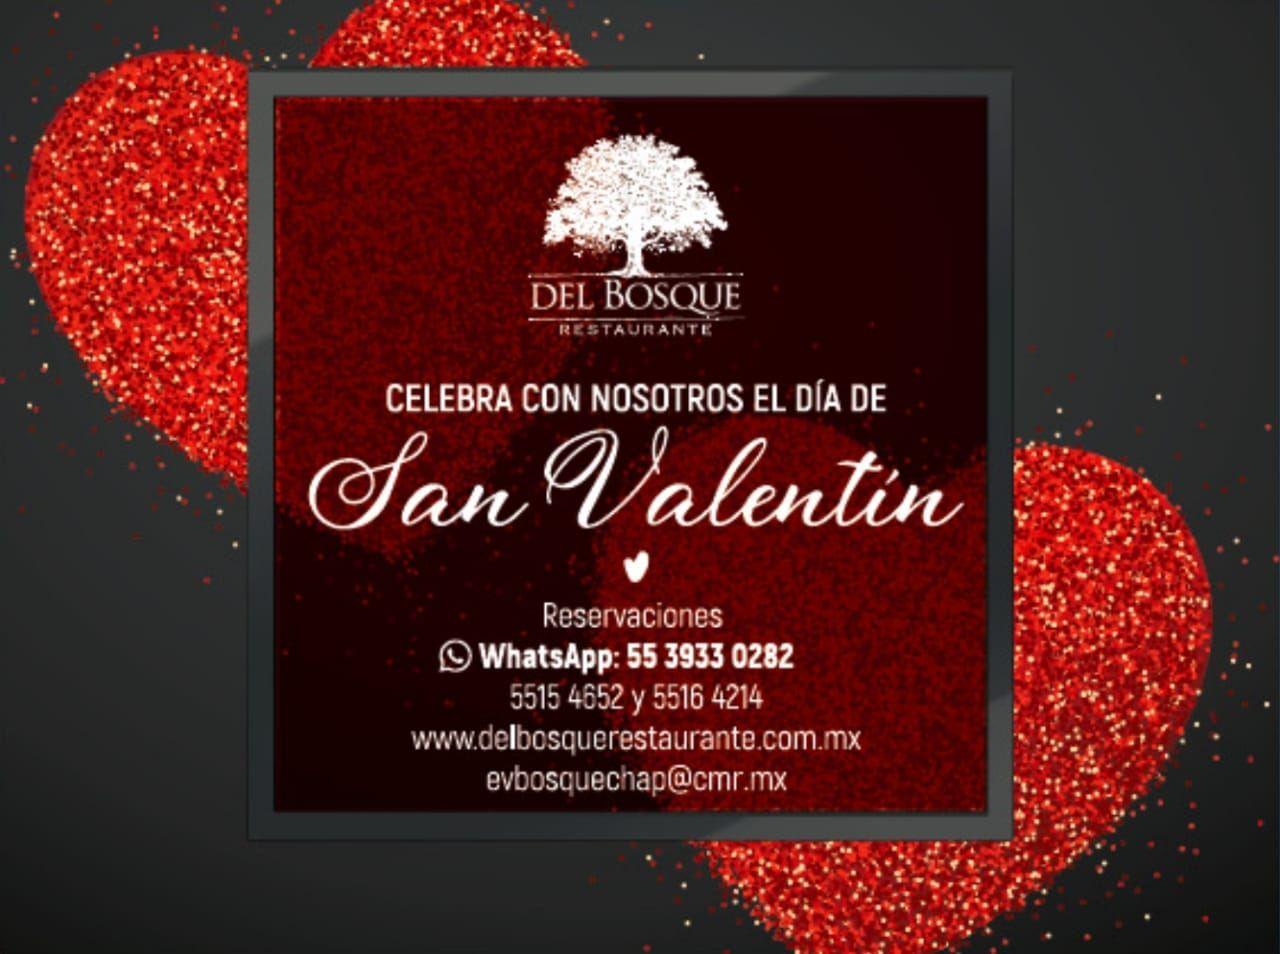 Foto de Cena de San Valentin